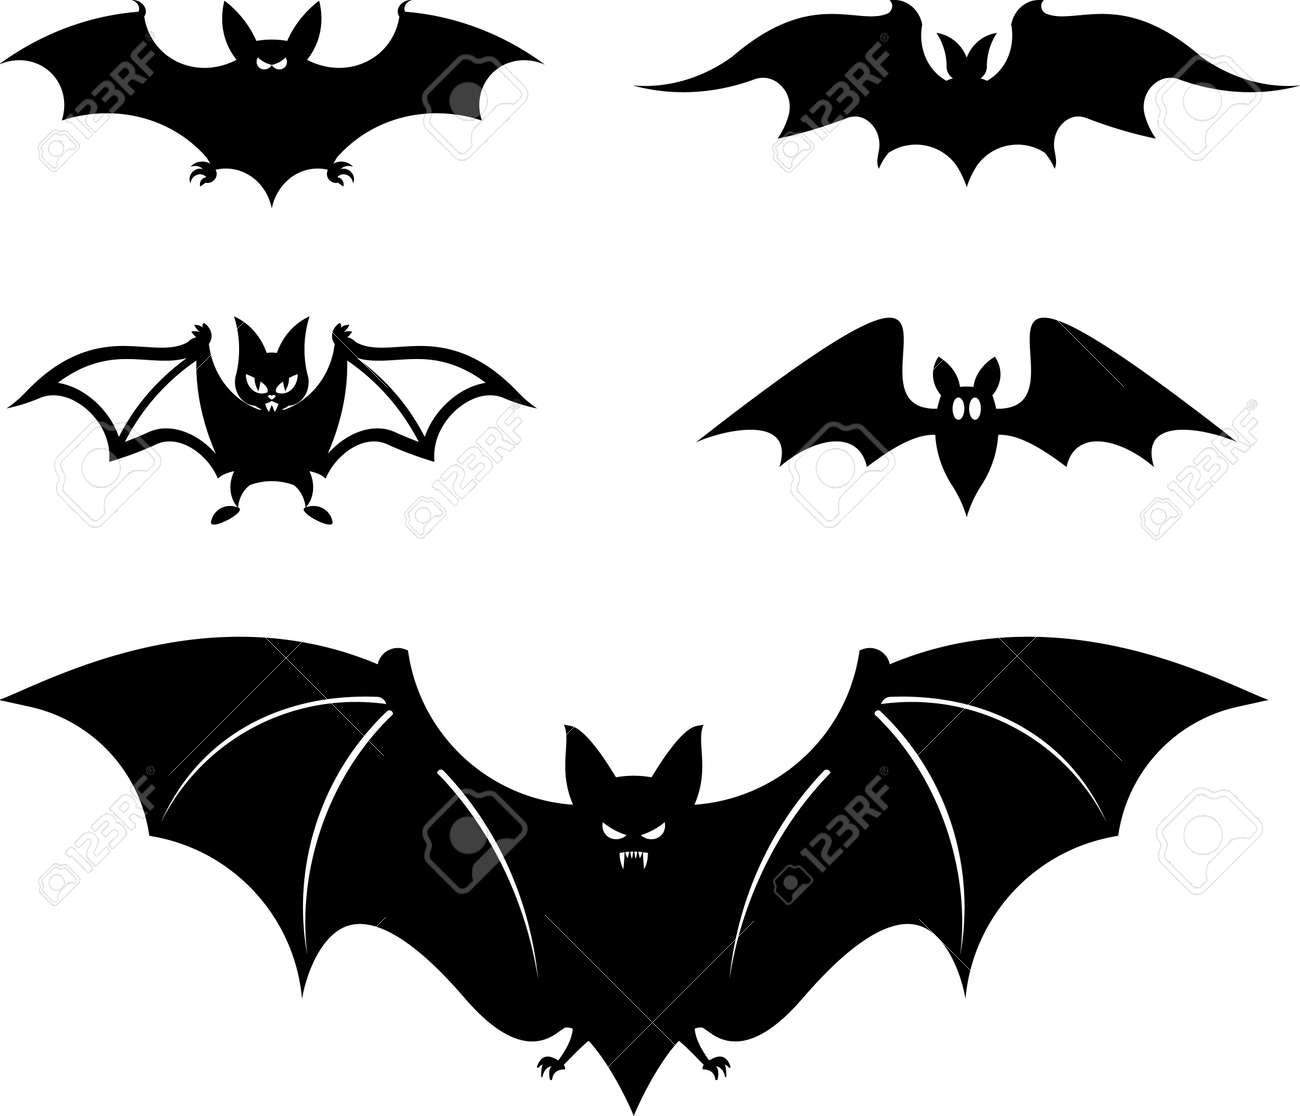 Halloween Bat Images & Stock Pictures. Royalty Free Halloween Bat ...